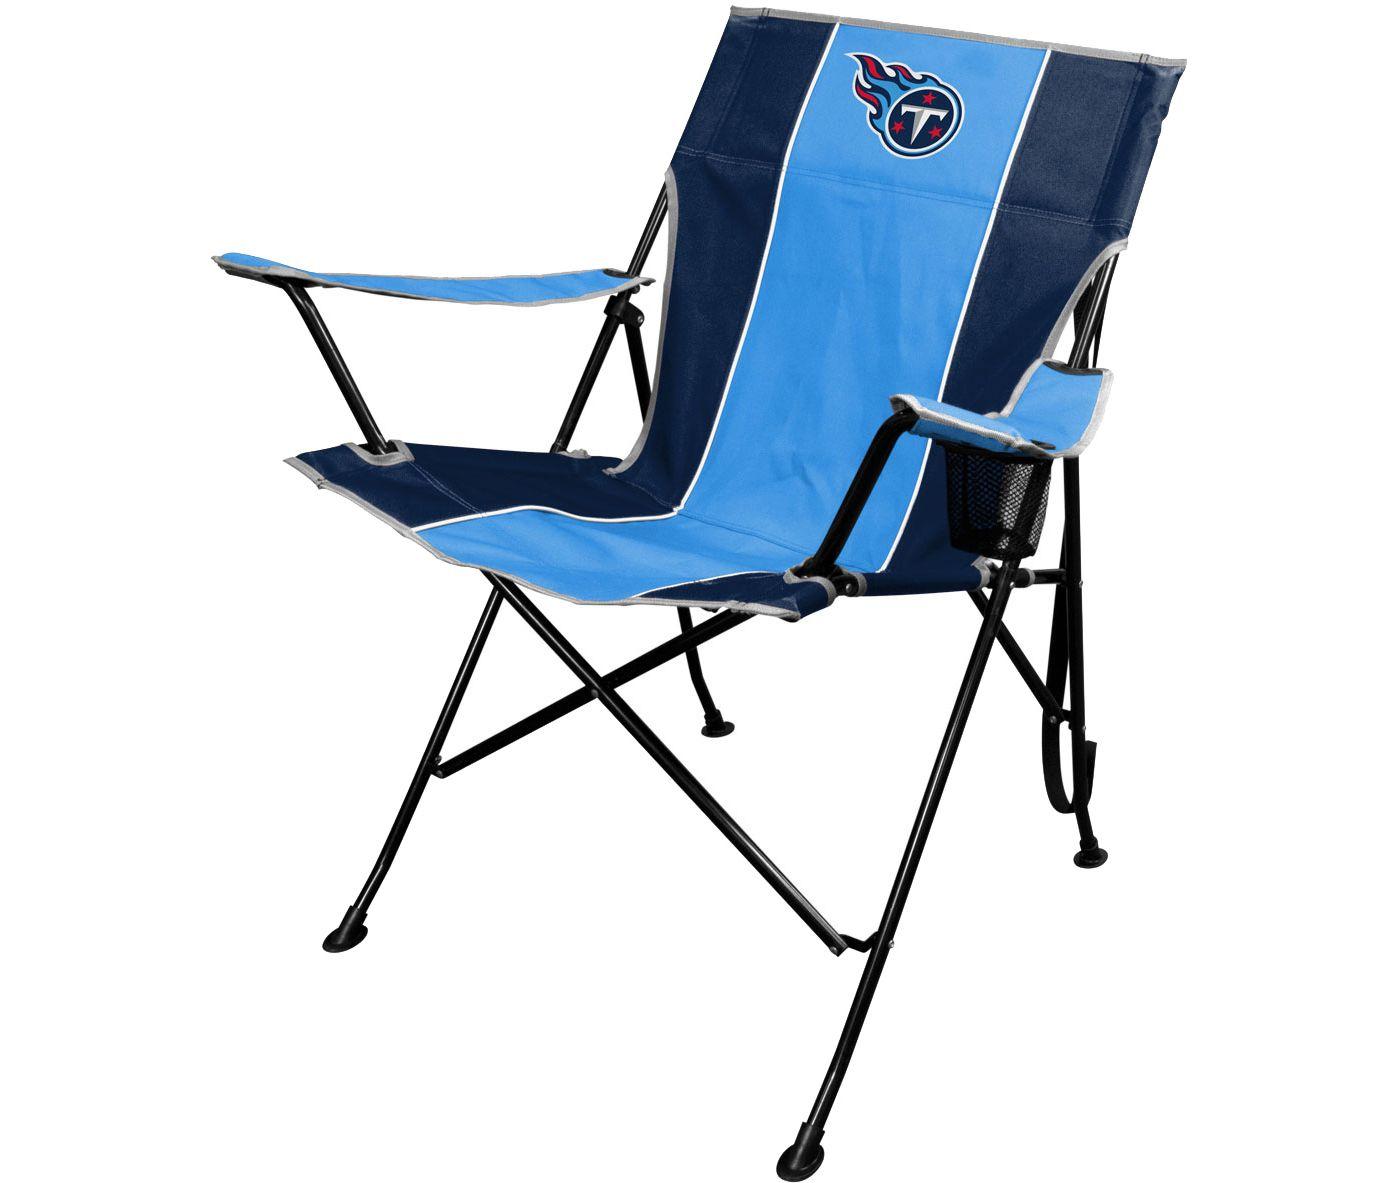 Rawlings Tennessee Titans TLG8 Chair